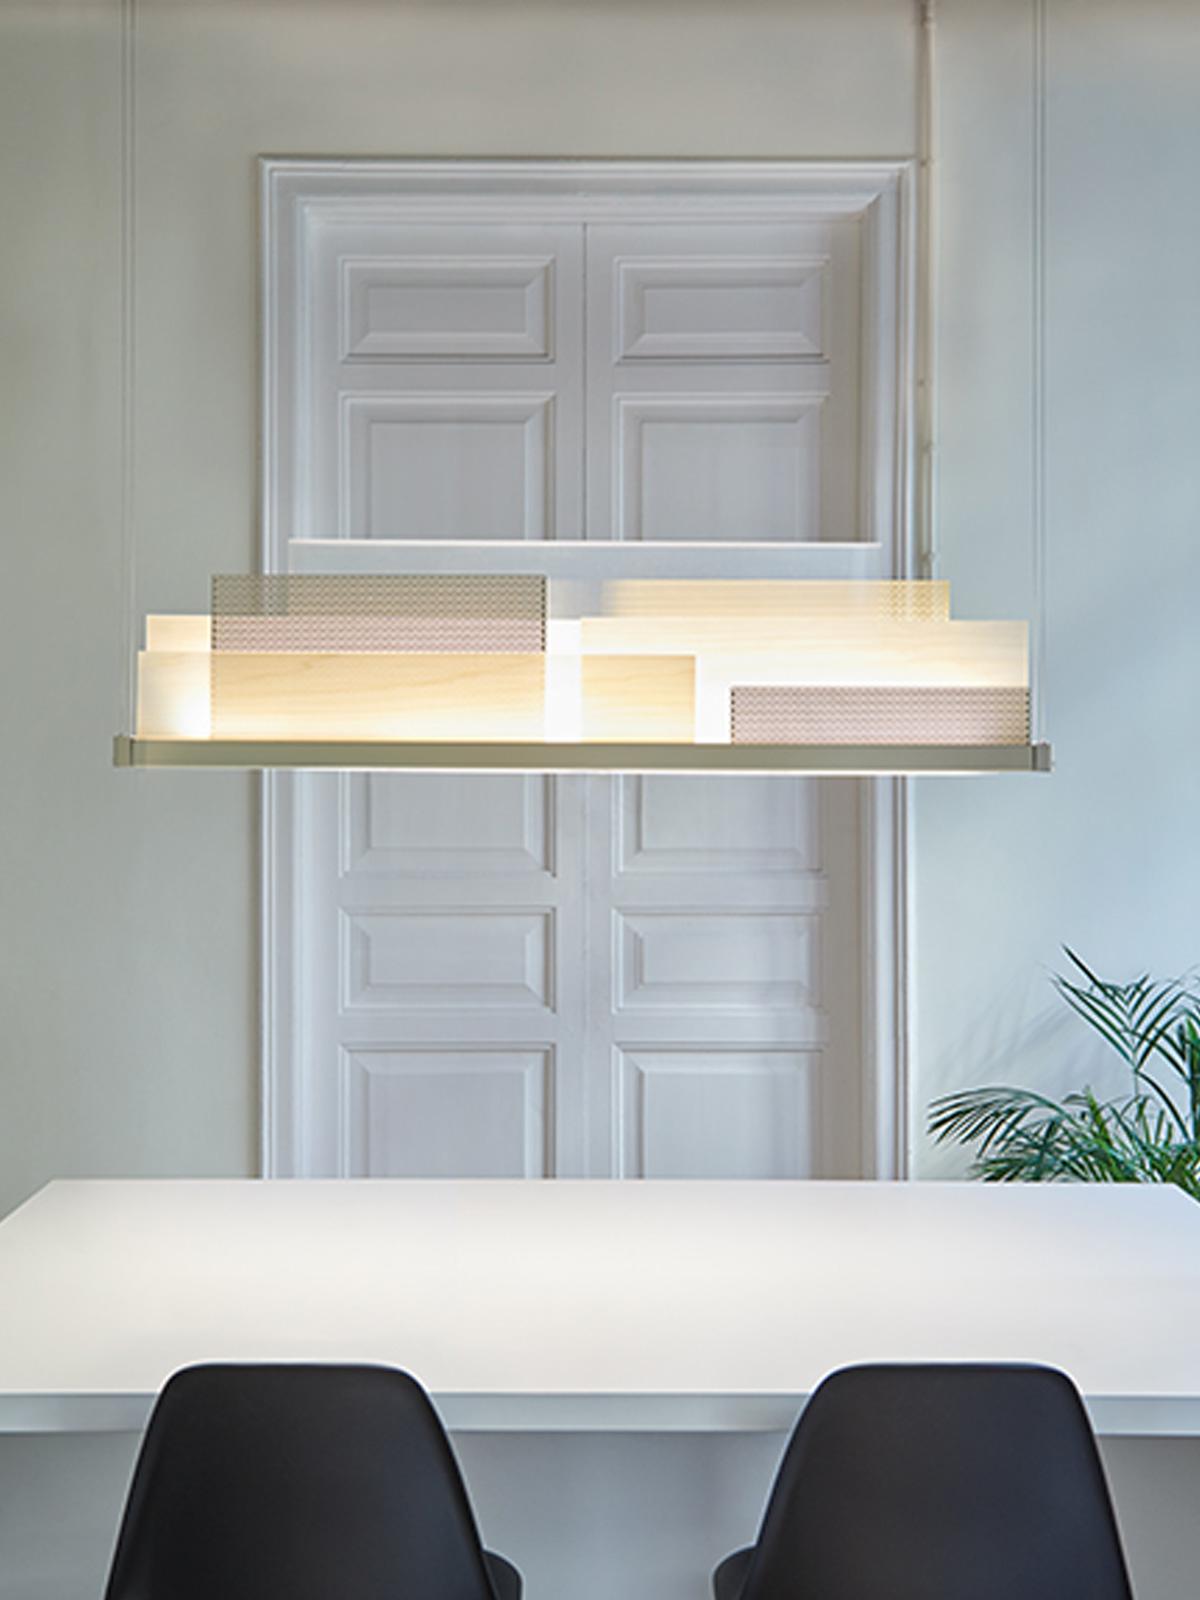 Skyline Pendelleuchte Deko Tisch LZF Lamps